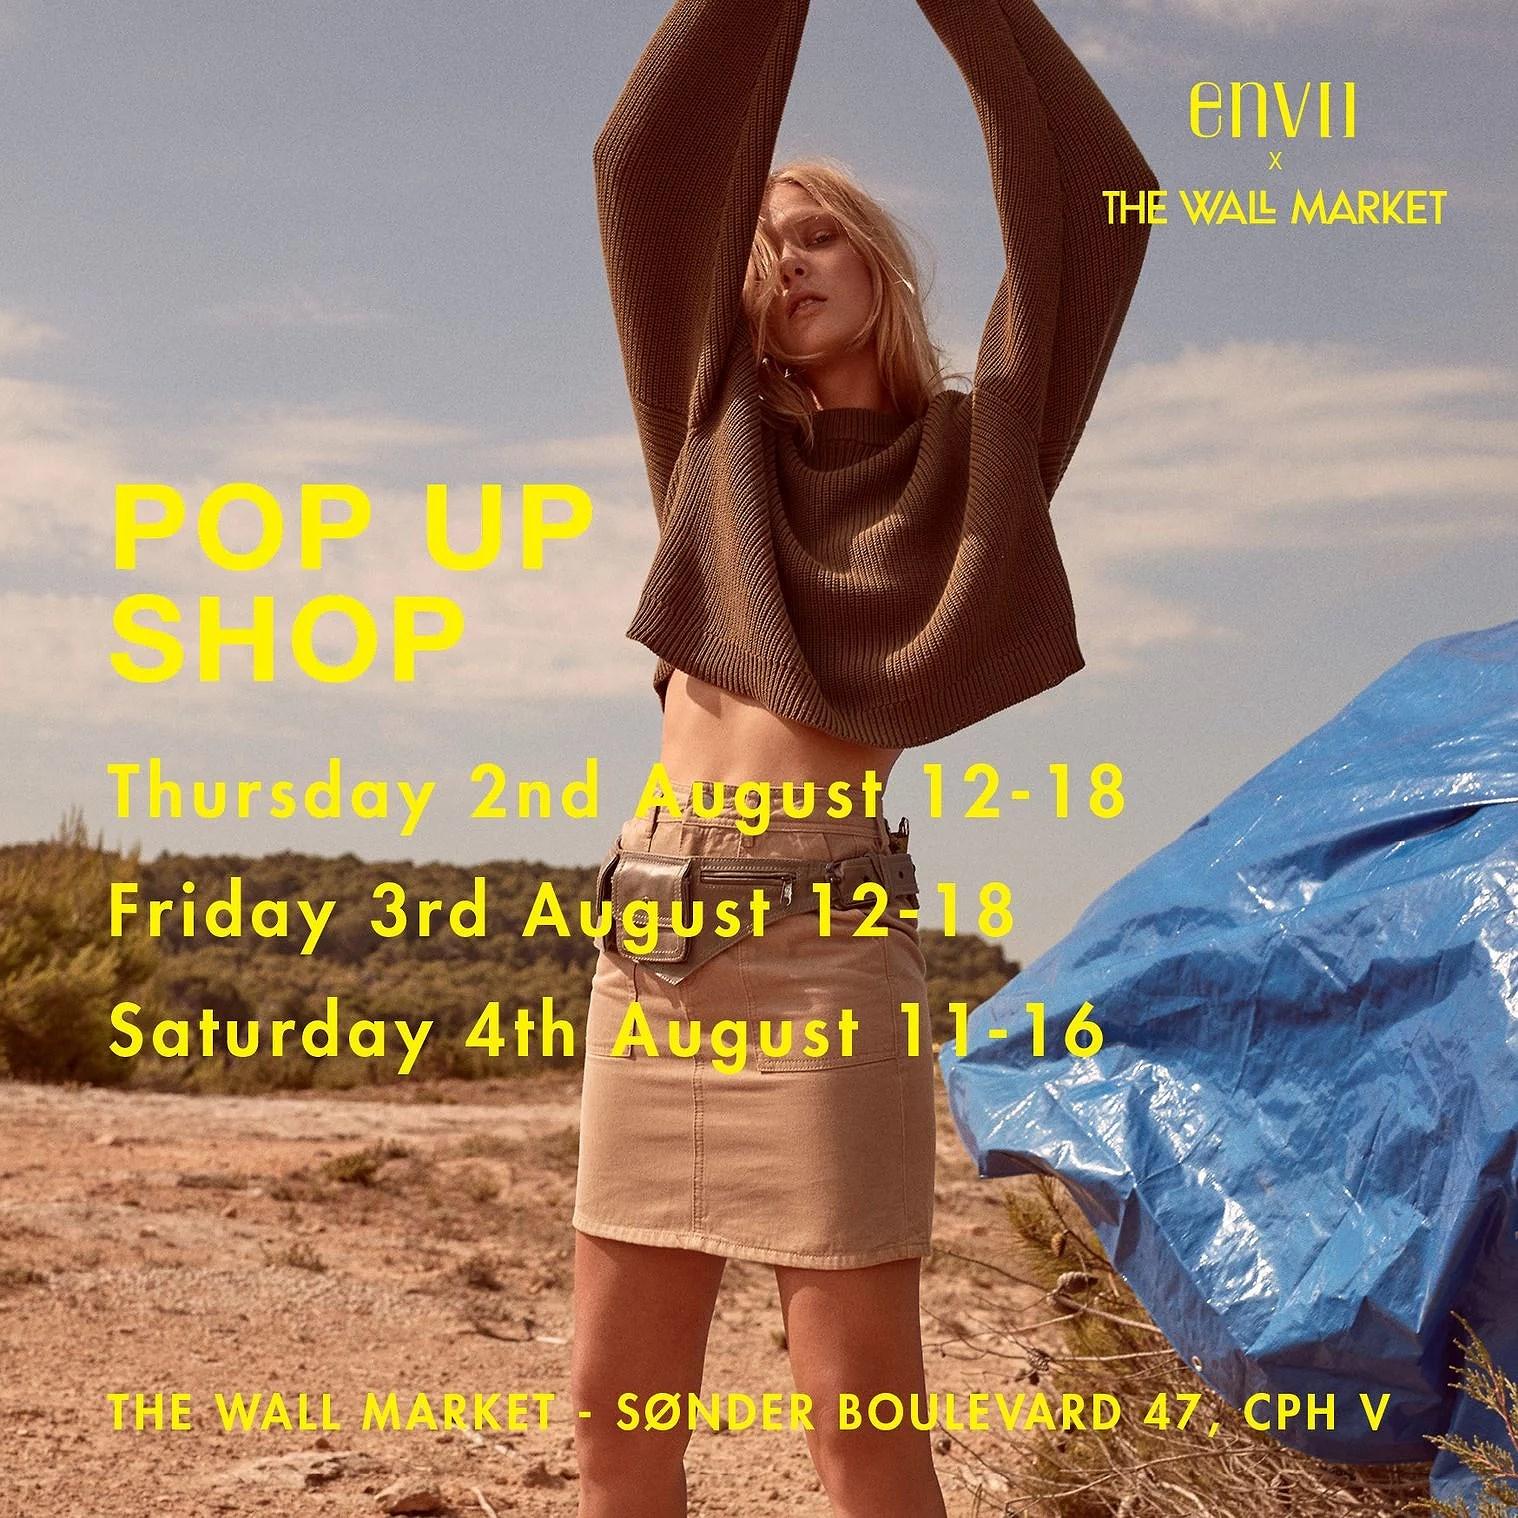 ENVII X THE WALL MARKET POP UP SHOP